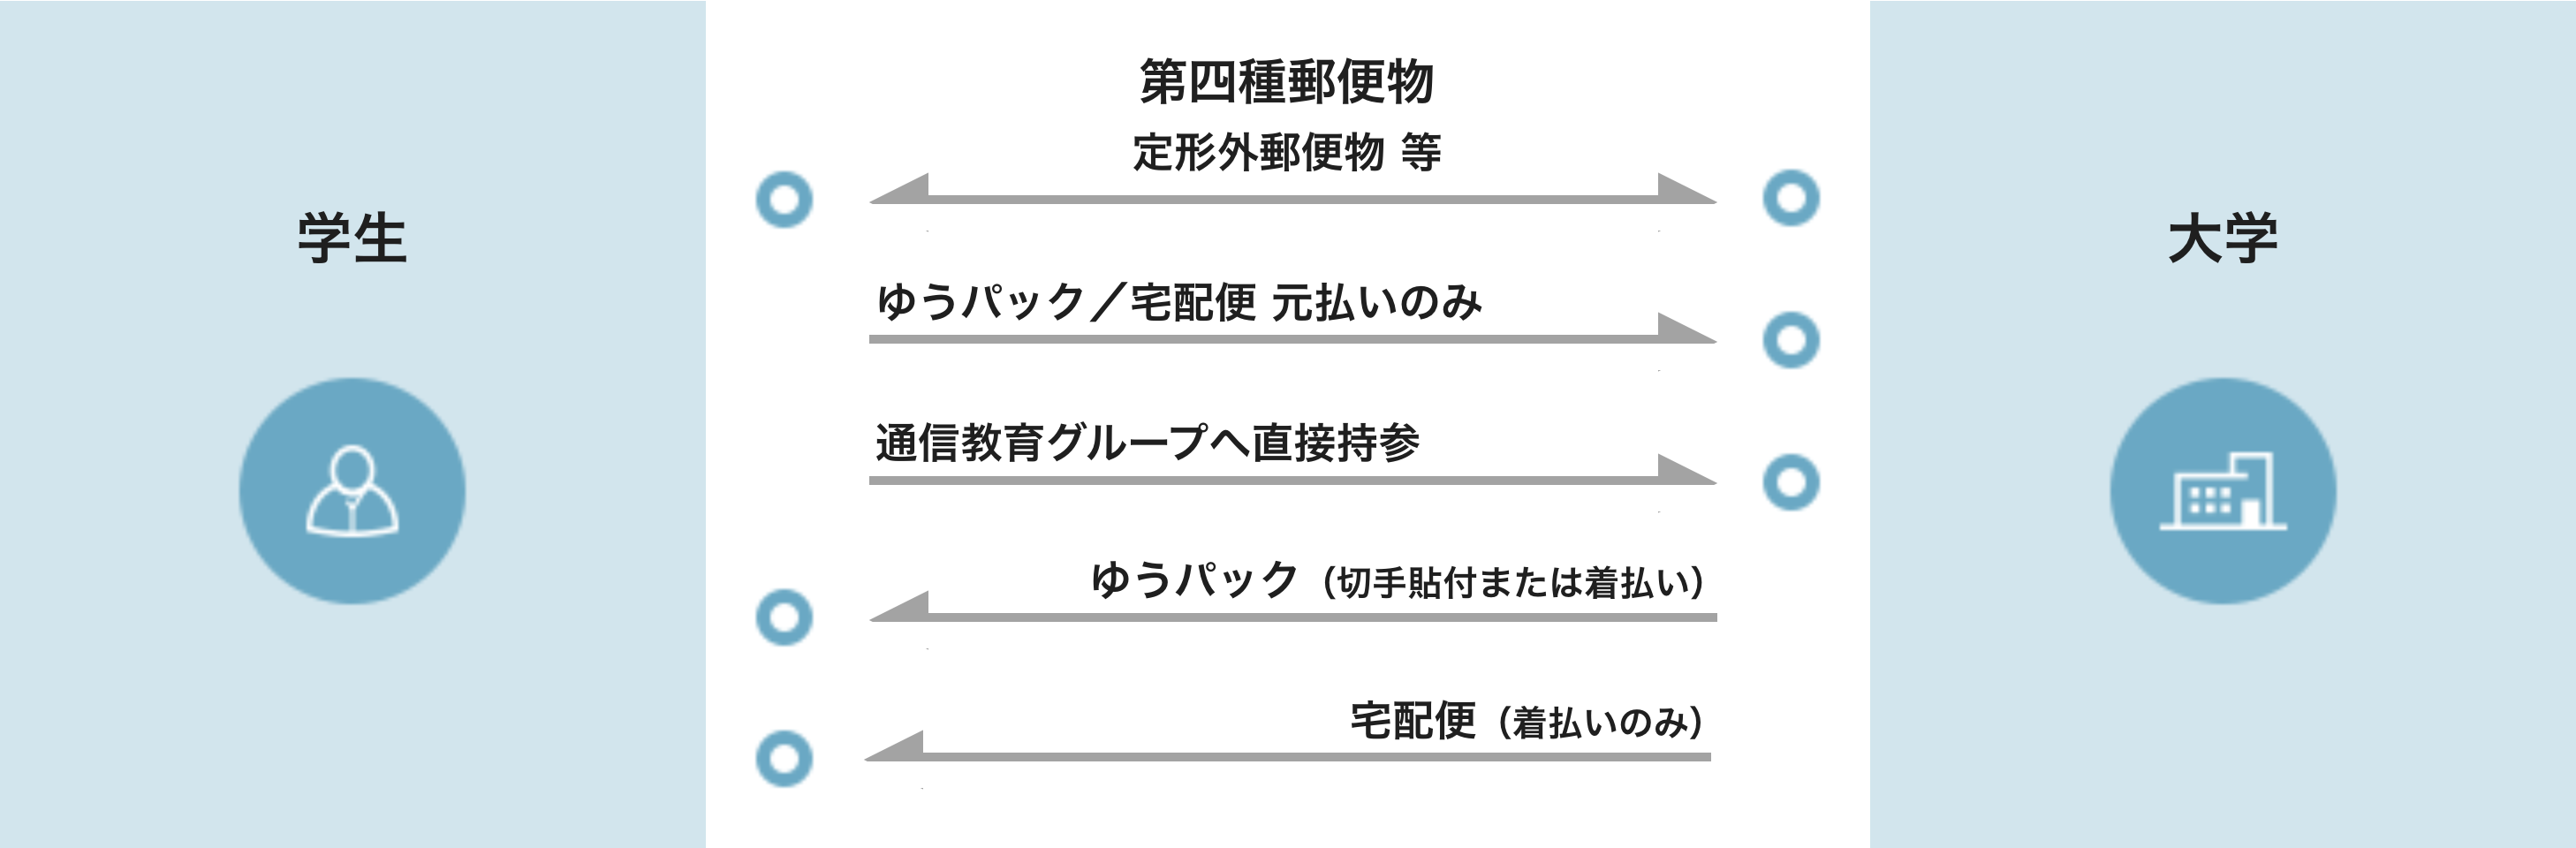 図:提出・返送方法の例